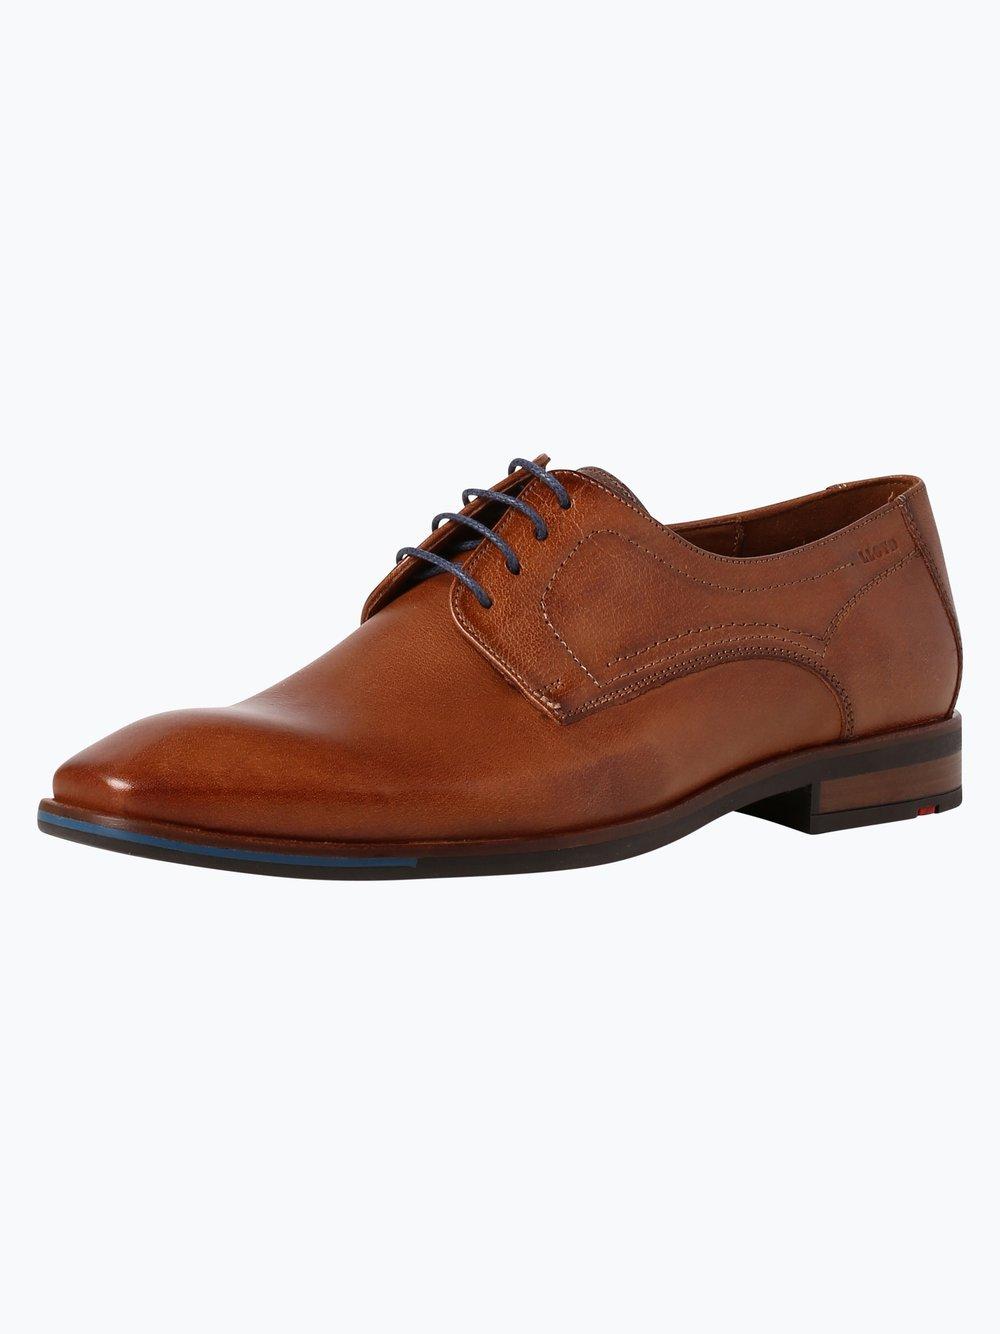 Lloyd – Męskie buty sznurowane ze skóry – Don, beżowy Van Graaf 342675-0004-00050